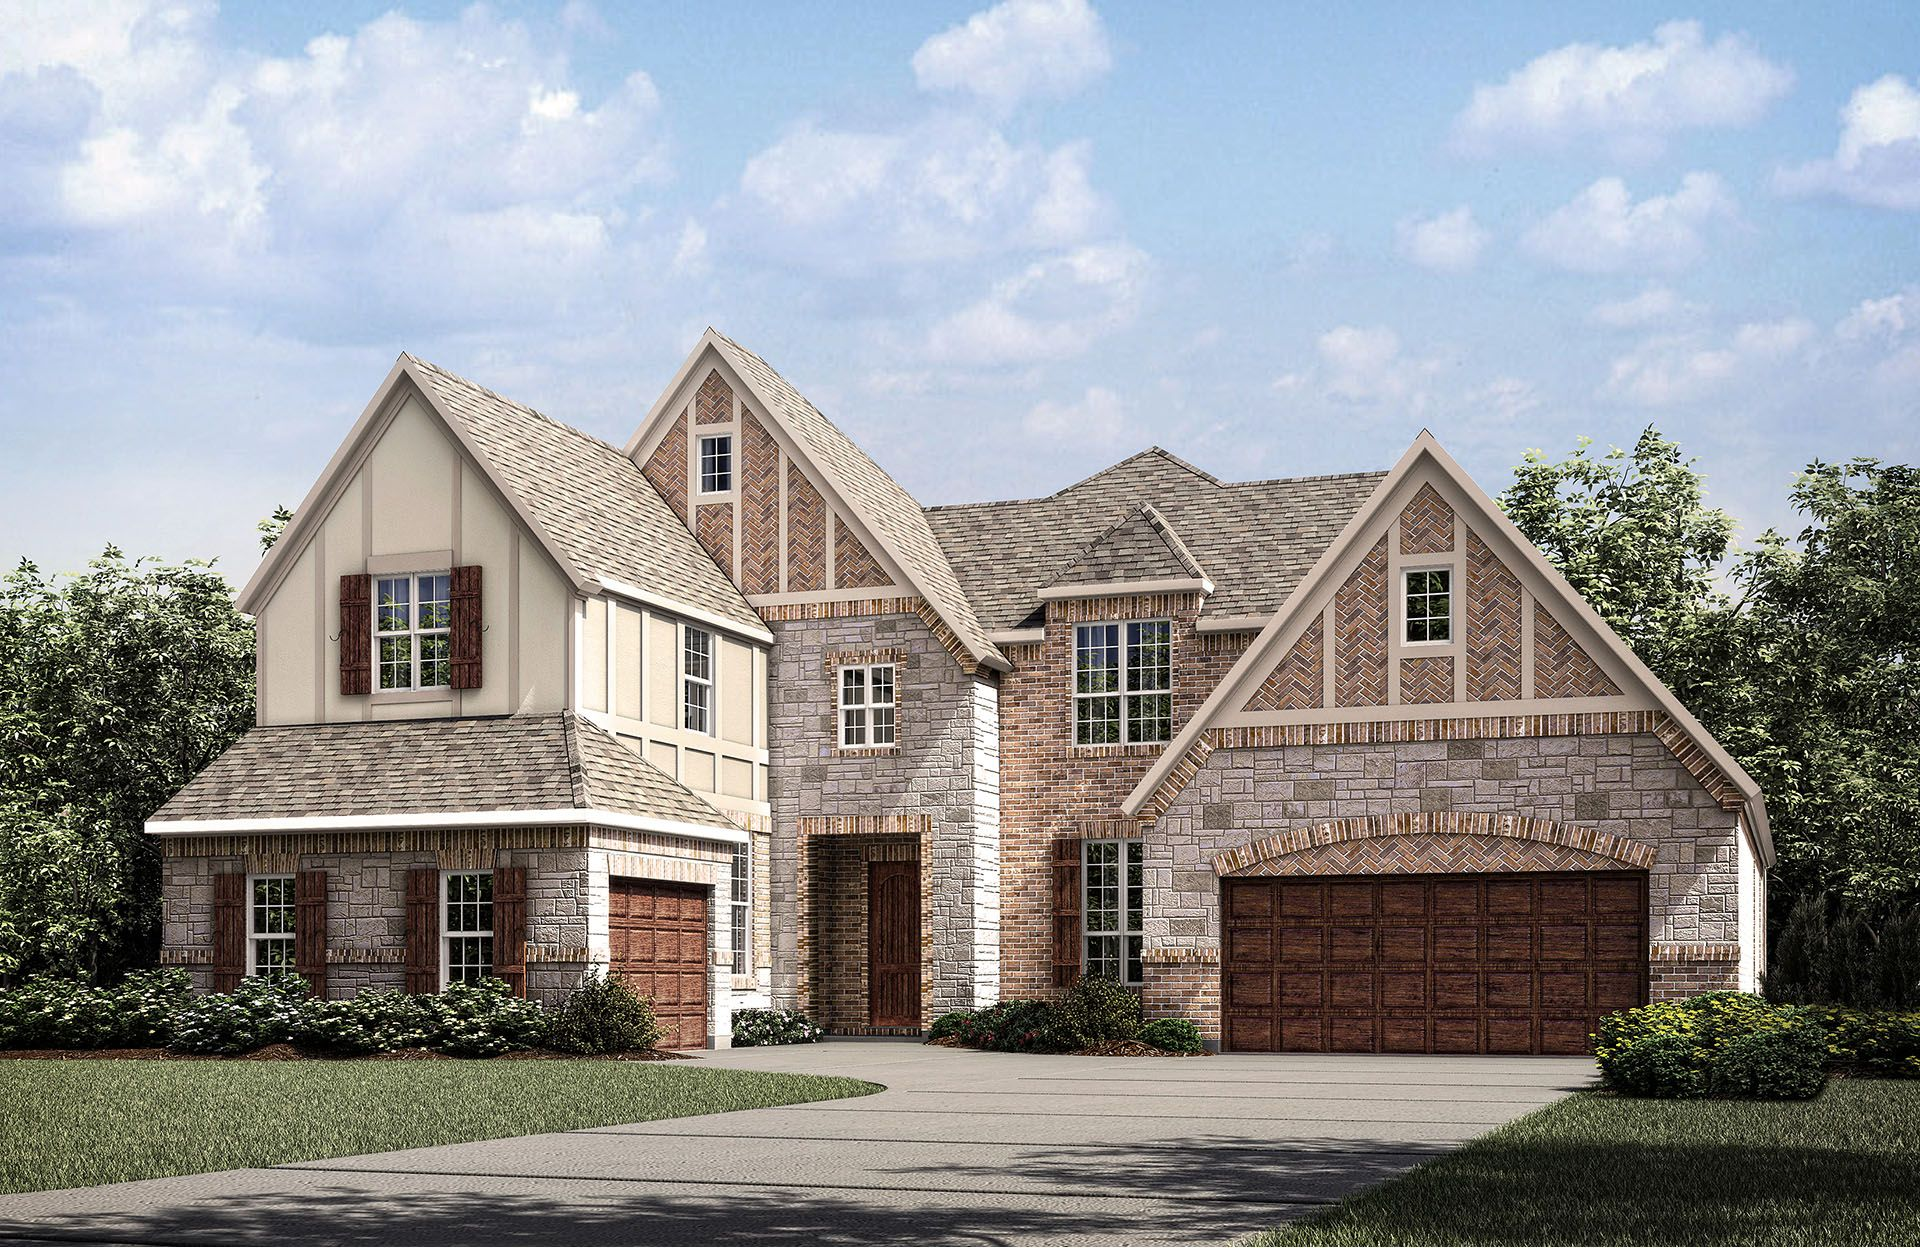 Unifamiliar por un Venta en Royal Brook At Kingwood - Antonio 3306 Lockridge Harbor Lane Porter, Texas 77365 United States